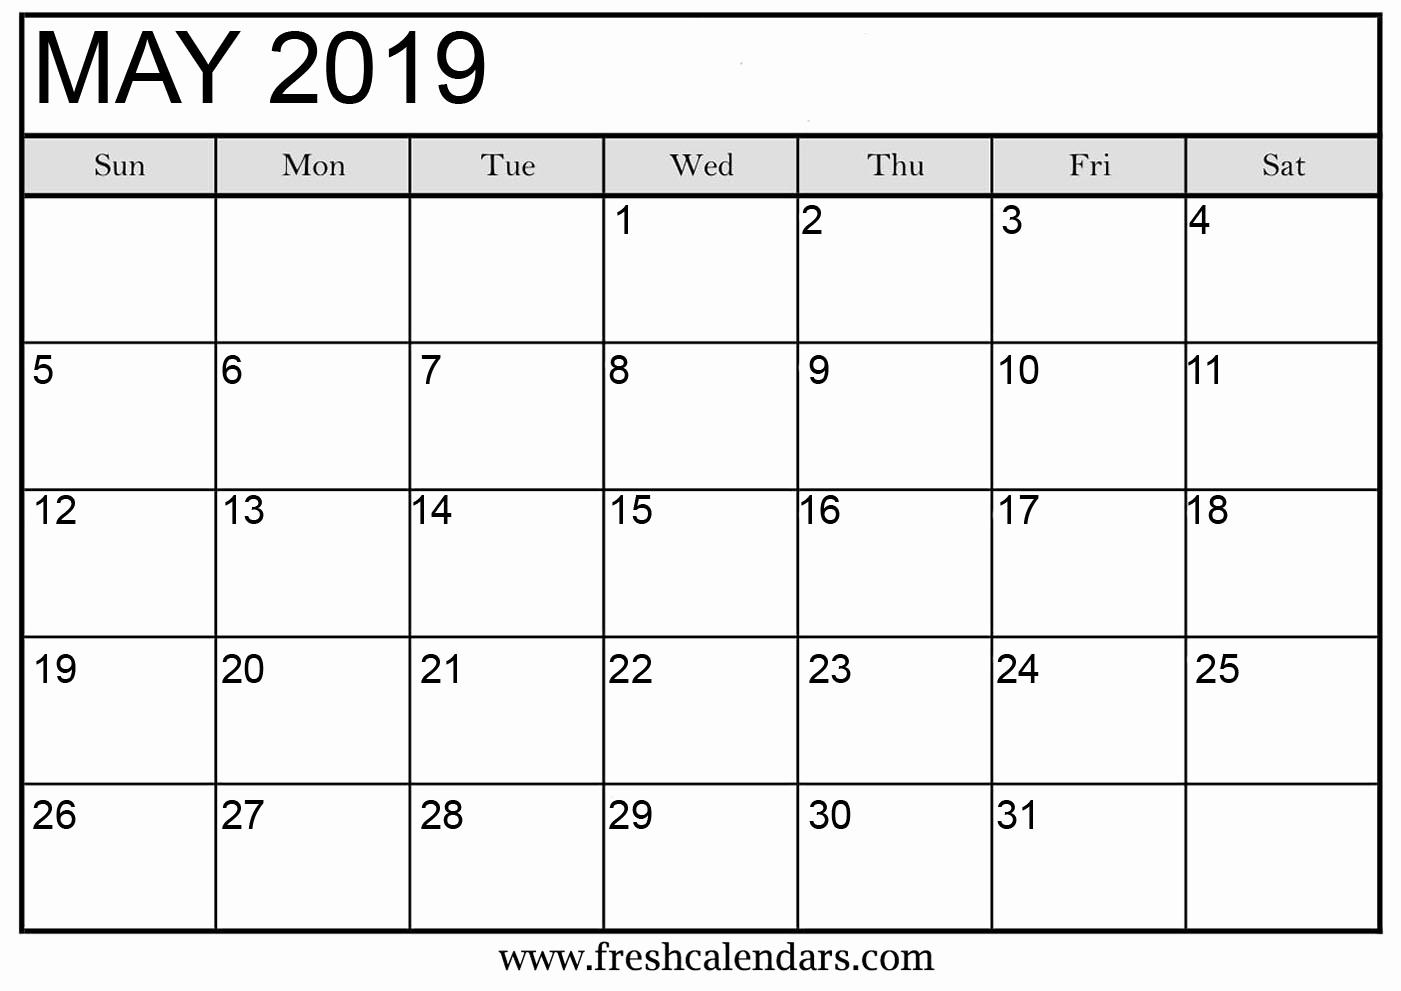 Monthly Calendar Template 2019 Elegant May 2019 Calendar Printable Fresh Calendars